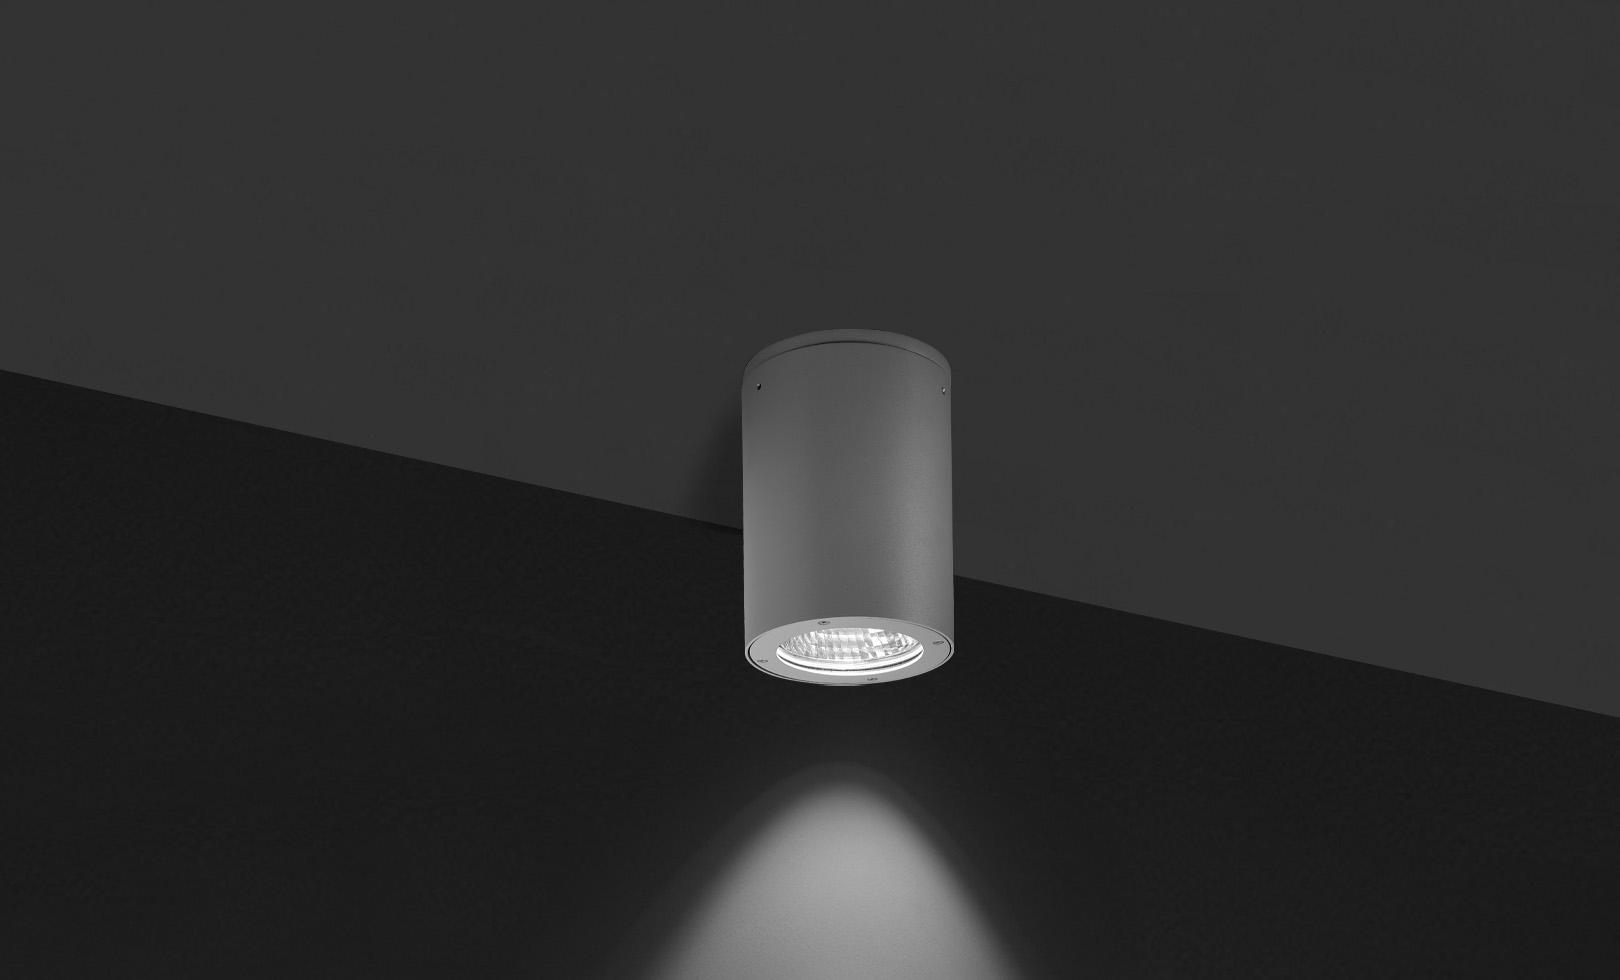 706005 TECH MEDIUM 03 ROUND LED 26W 1